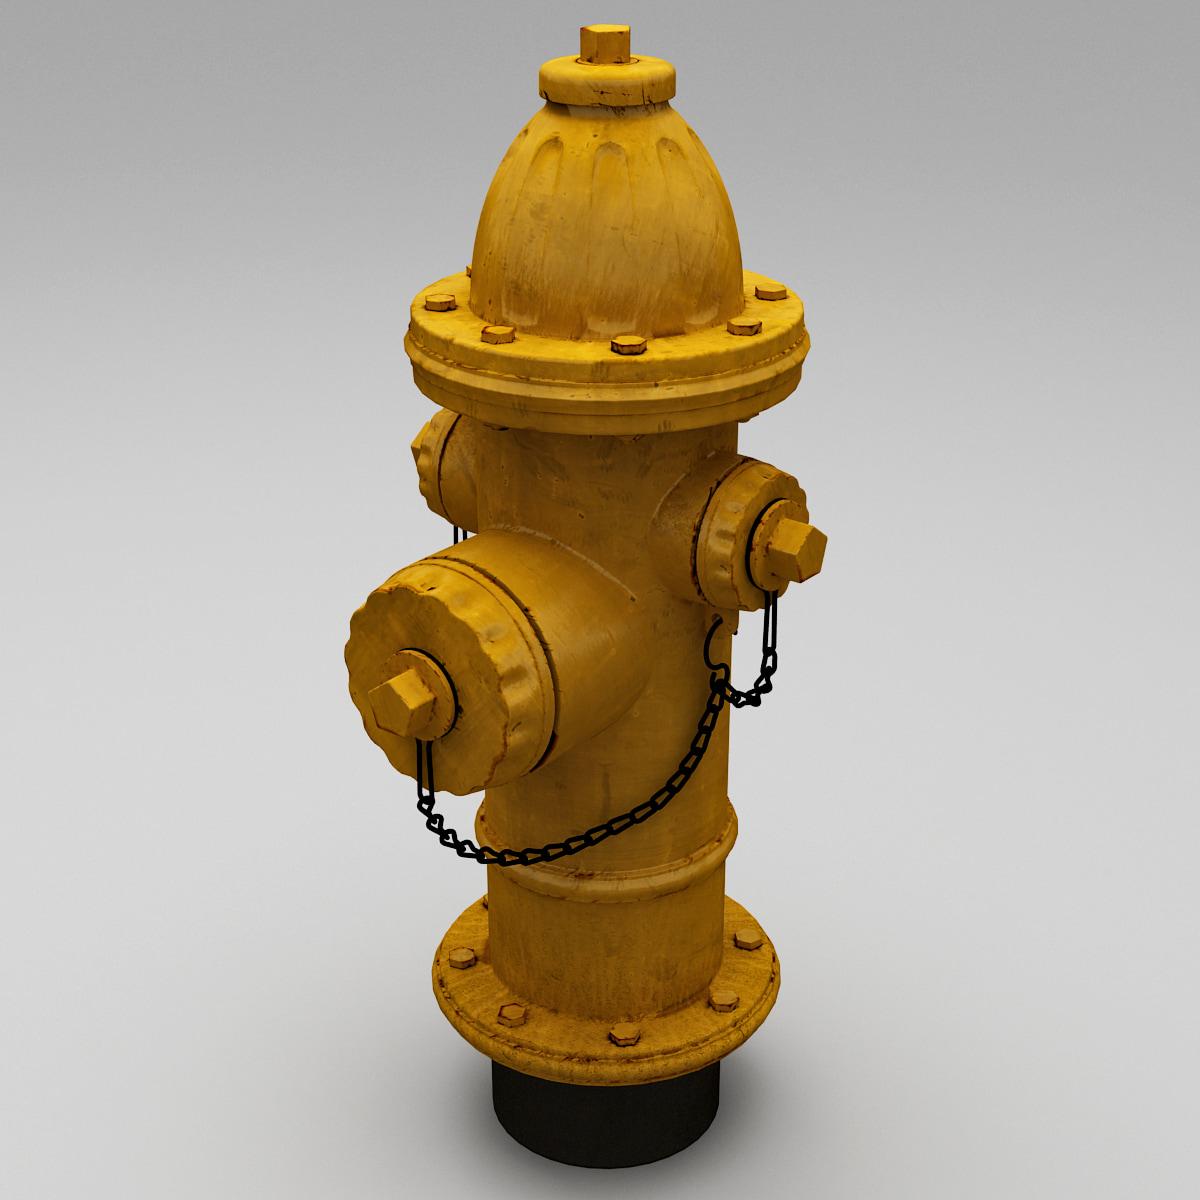 Fire_Hydrant_V4_0001.jpg